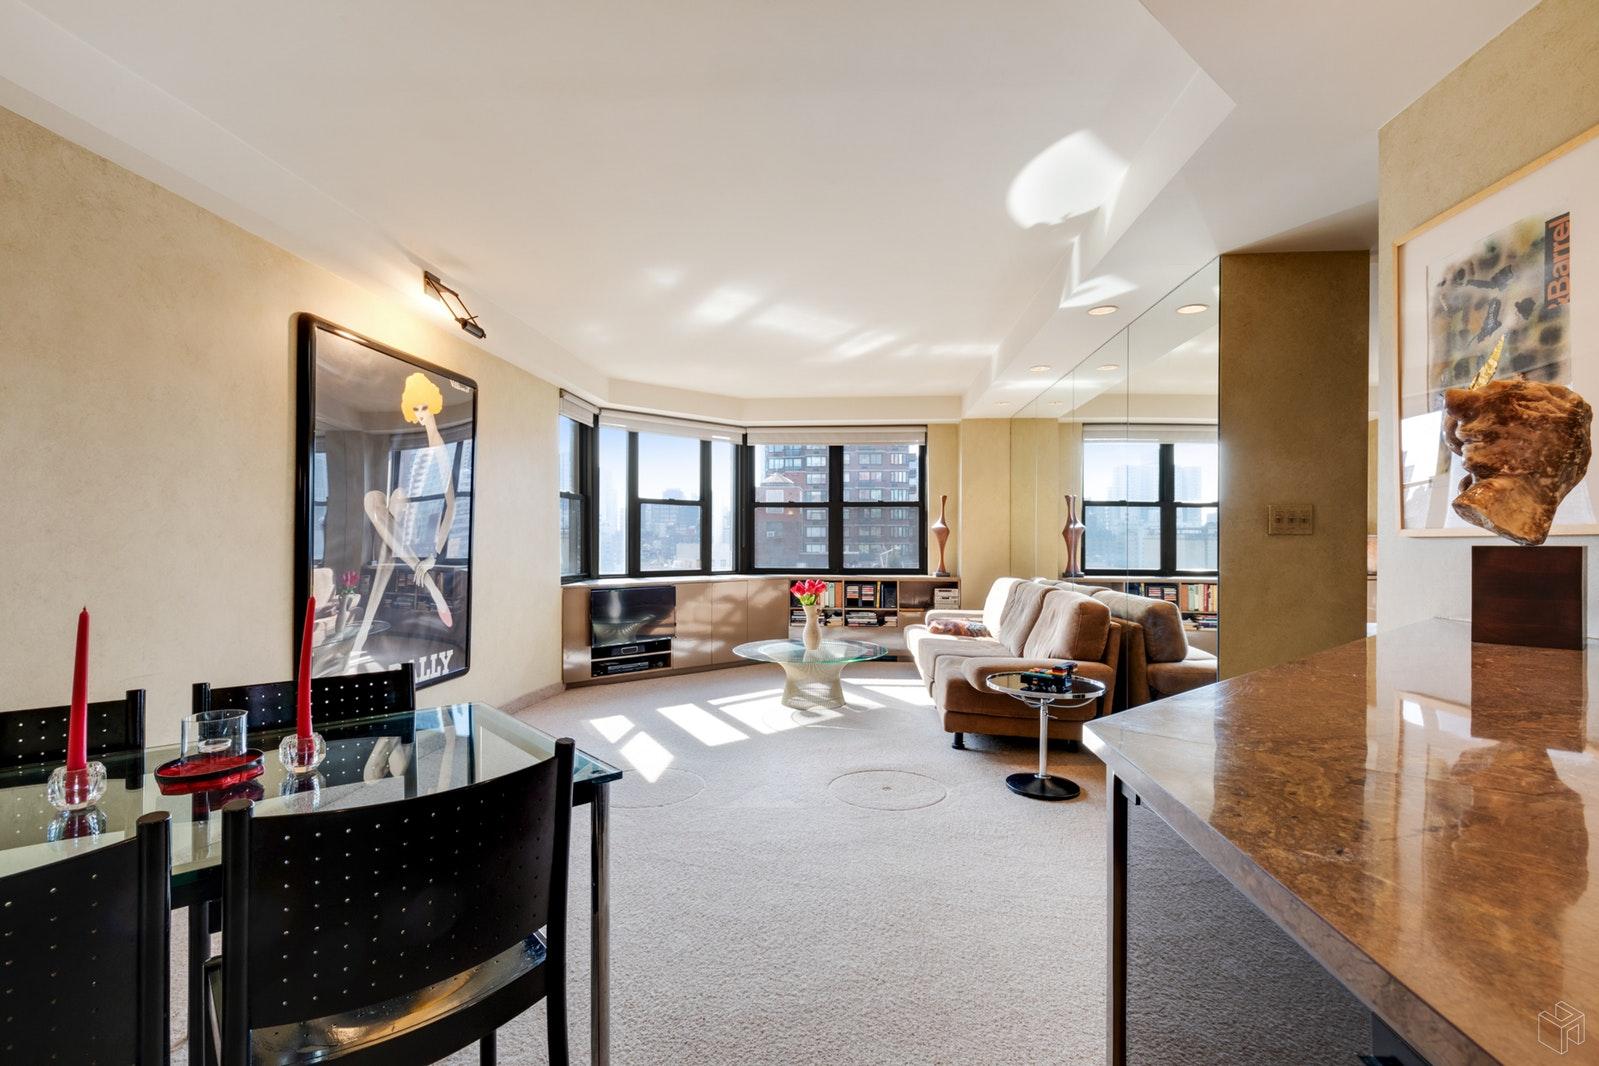 301 EAST 63RD STREET 17E, Upper East Side, $399,000, Web #: 19447129